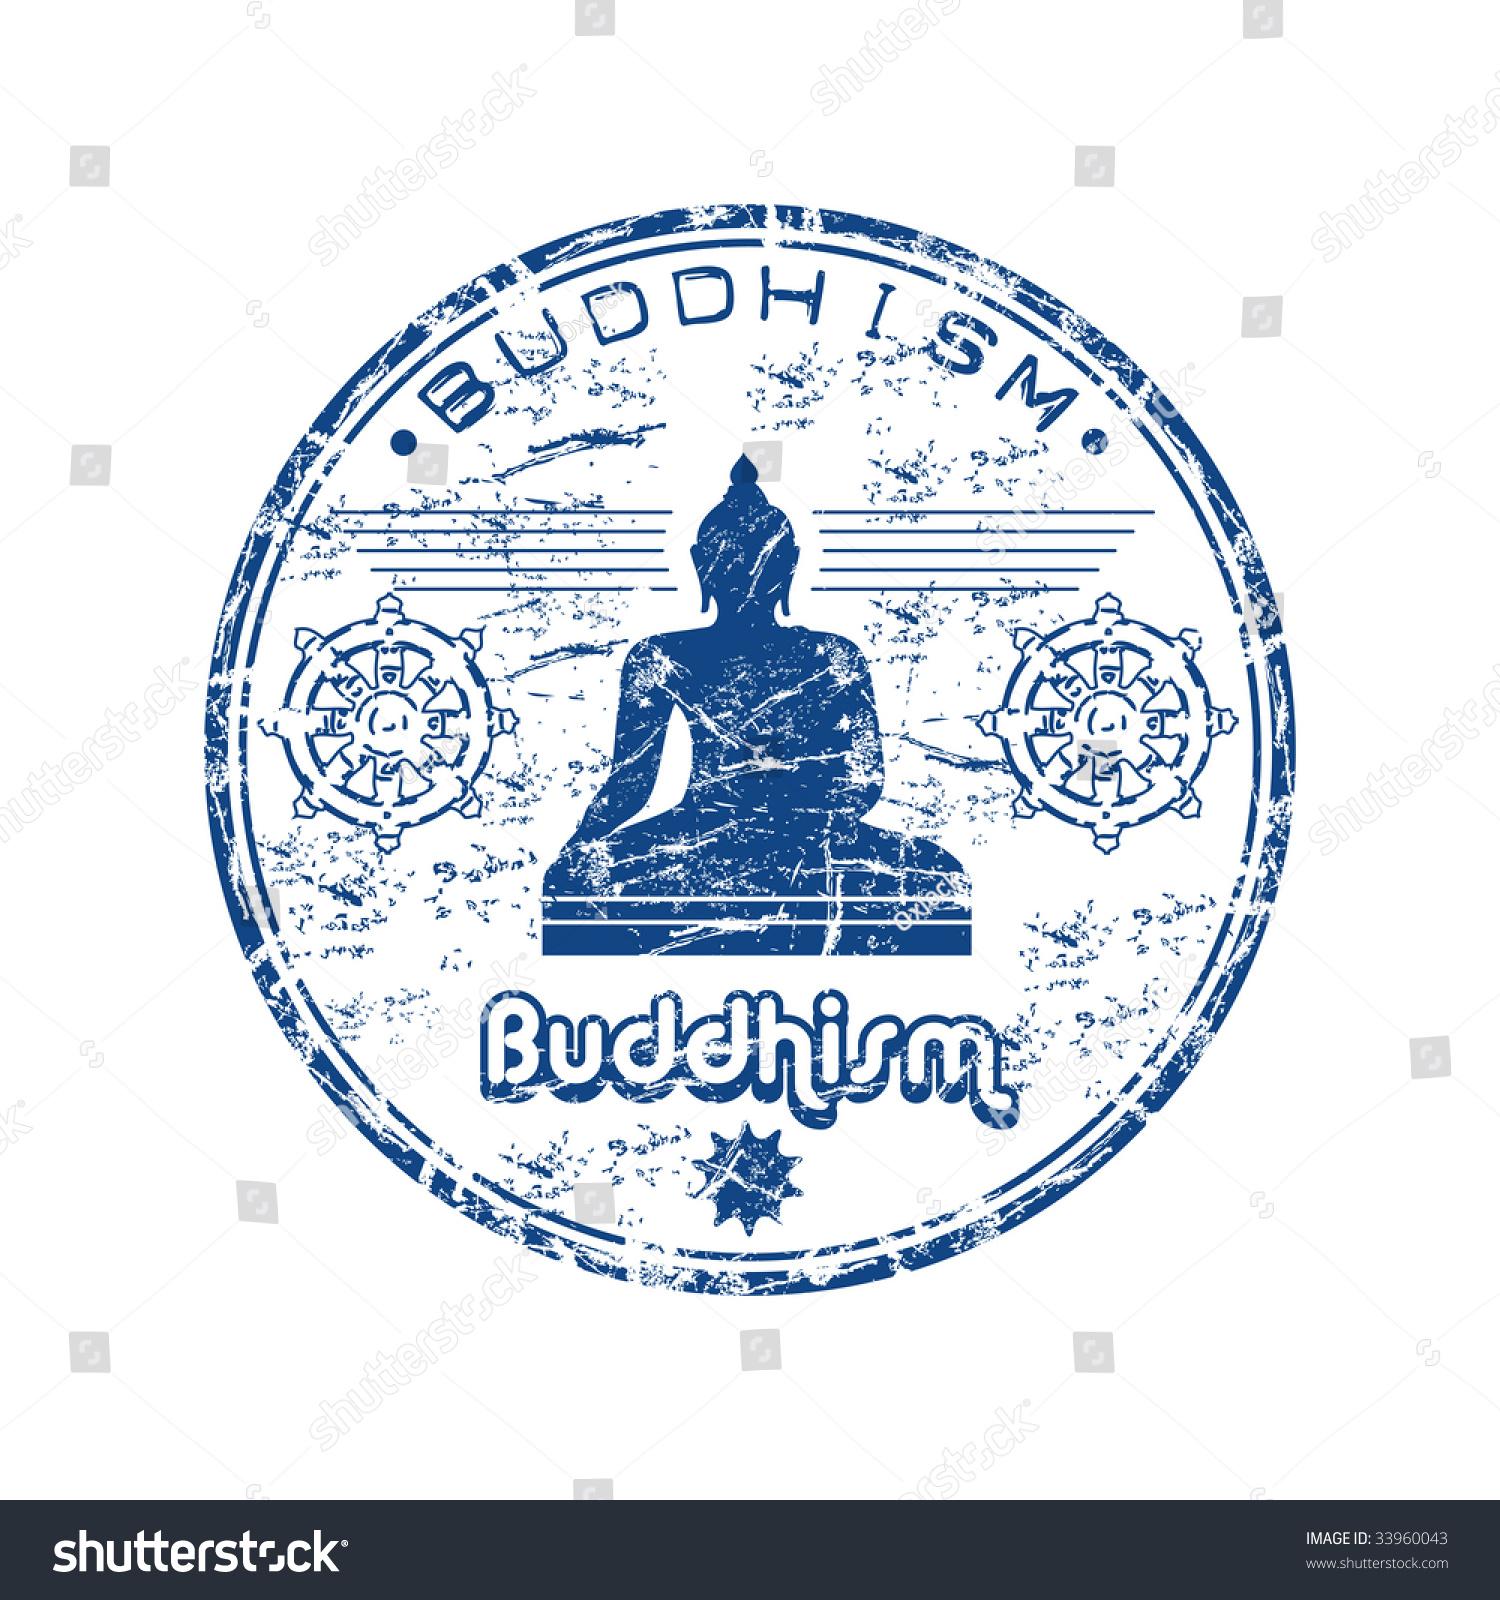 Blue grunge rubber stamp silhouette buddha stock vector 33960043 blue grunge rubber stamp with the silhouette of buddha and buddhist symbols buddhism concept biocorpaavc Images